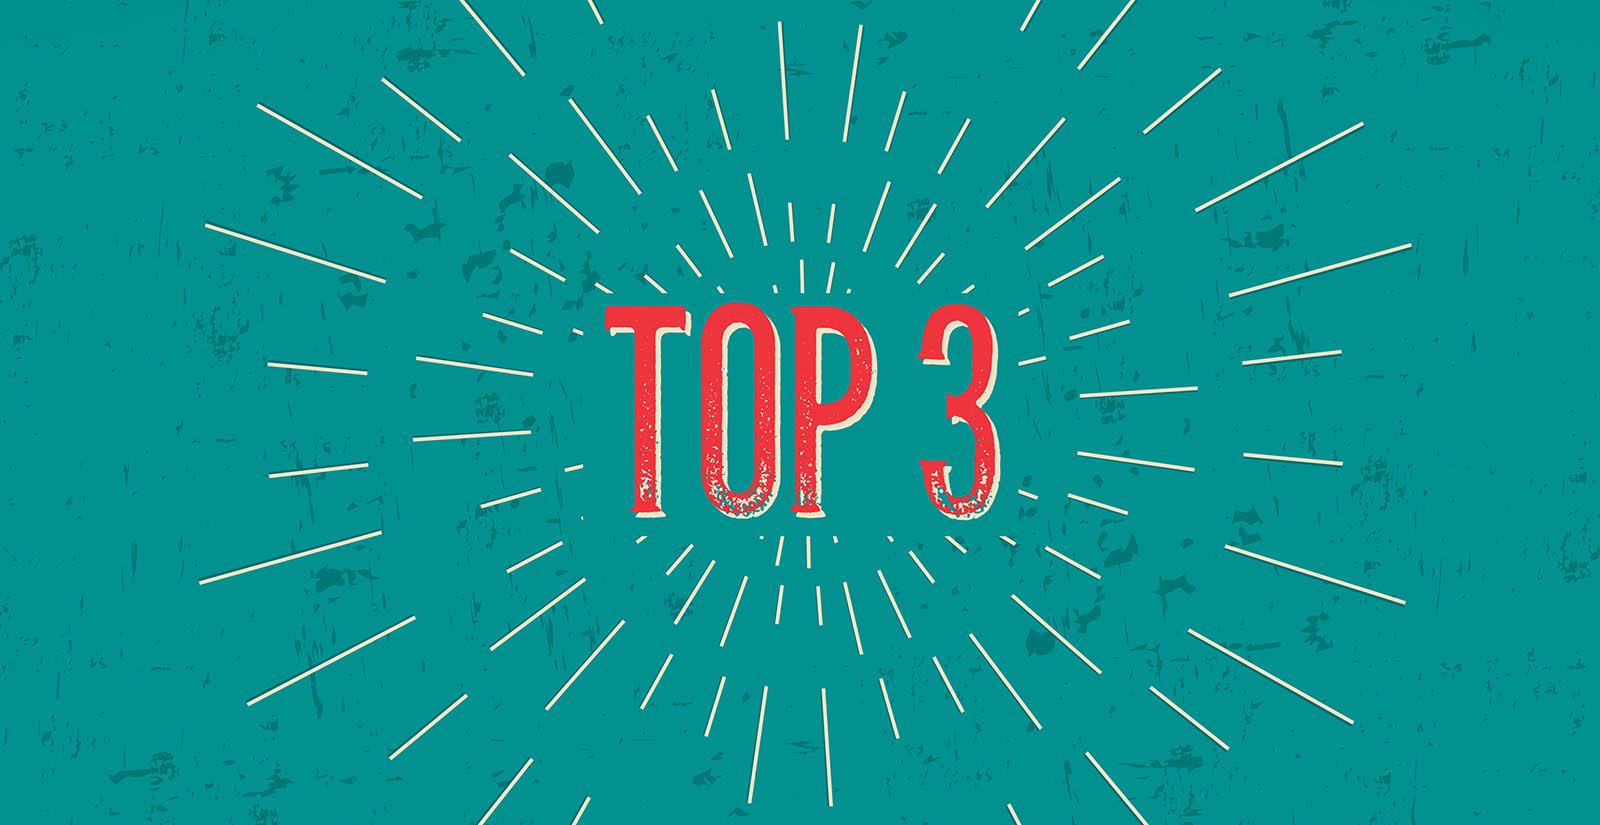 Top 3 image header